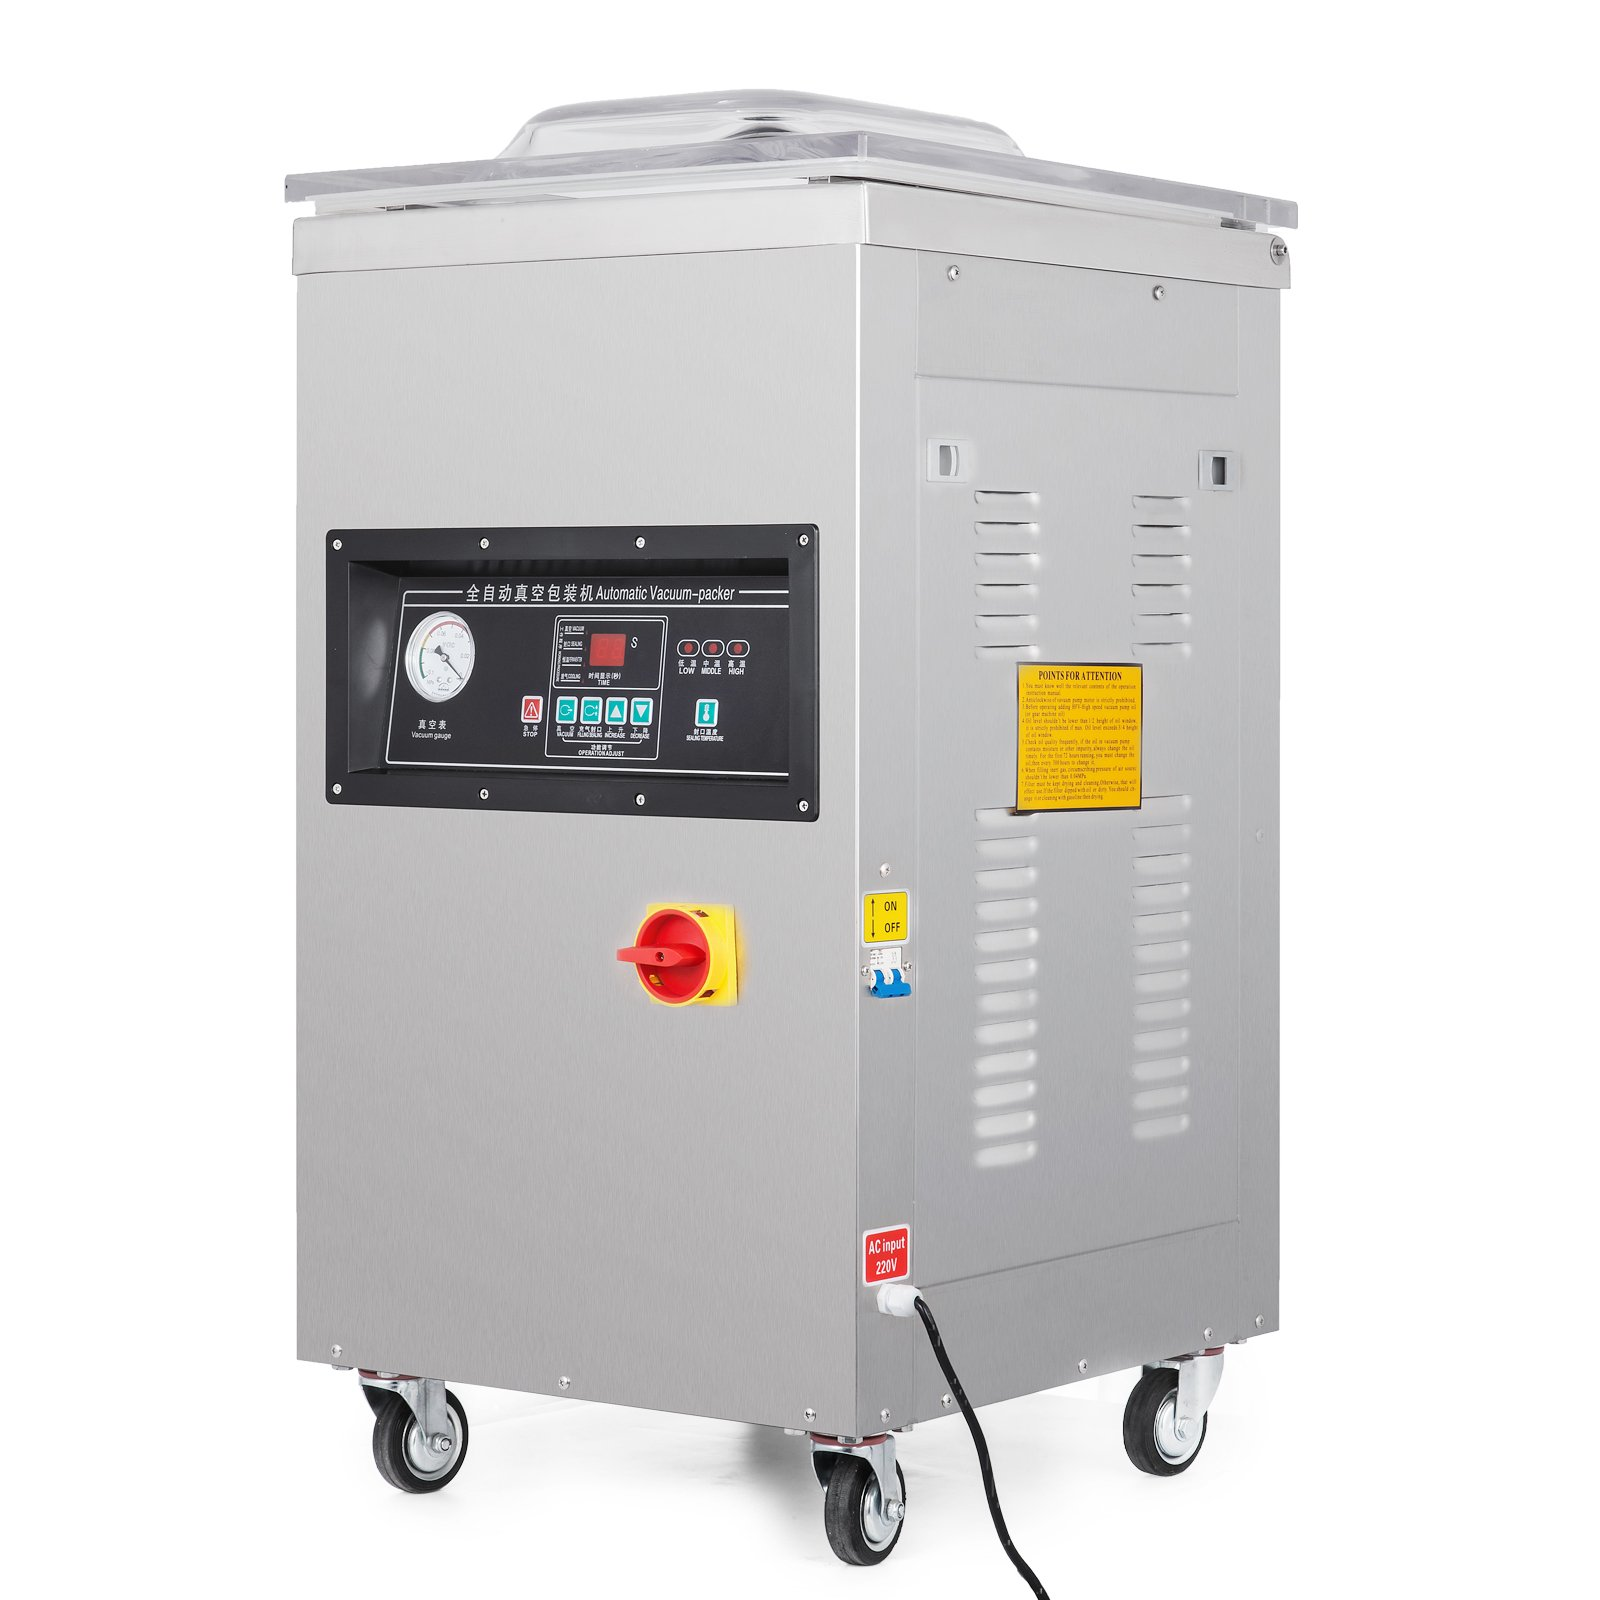 Happybuy DZ-400/2E Chamber Vacuum Sealer 1000W Vacuum Sealer Machine Automatic Vacuum Packing Sealing Sealer Machine for Home or Commercial Use (DZ-400/2E) by Happybuy (Image #3)